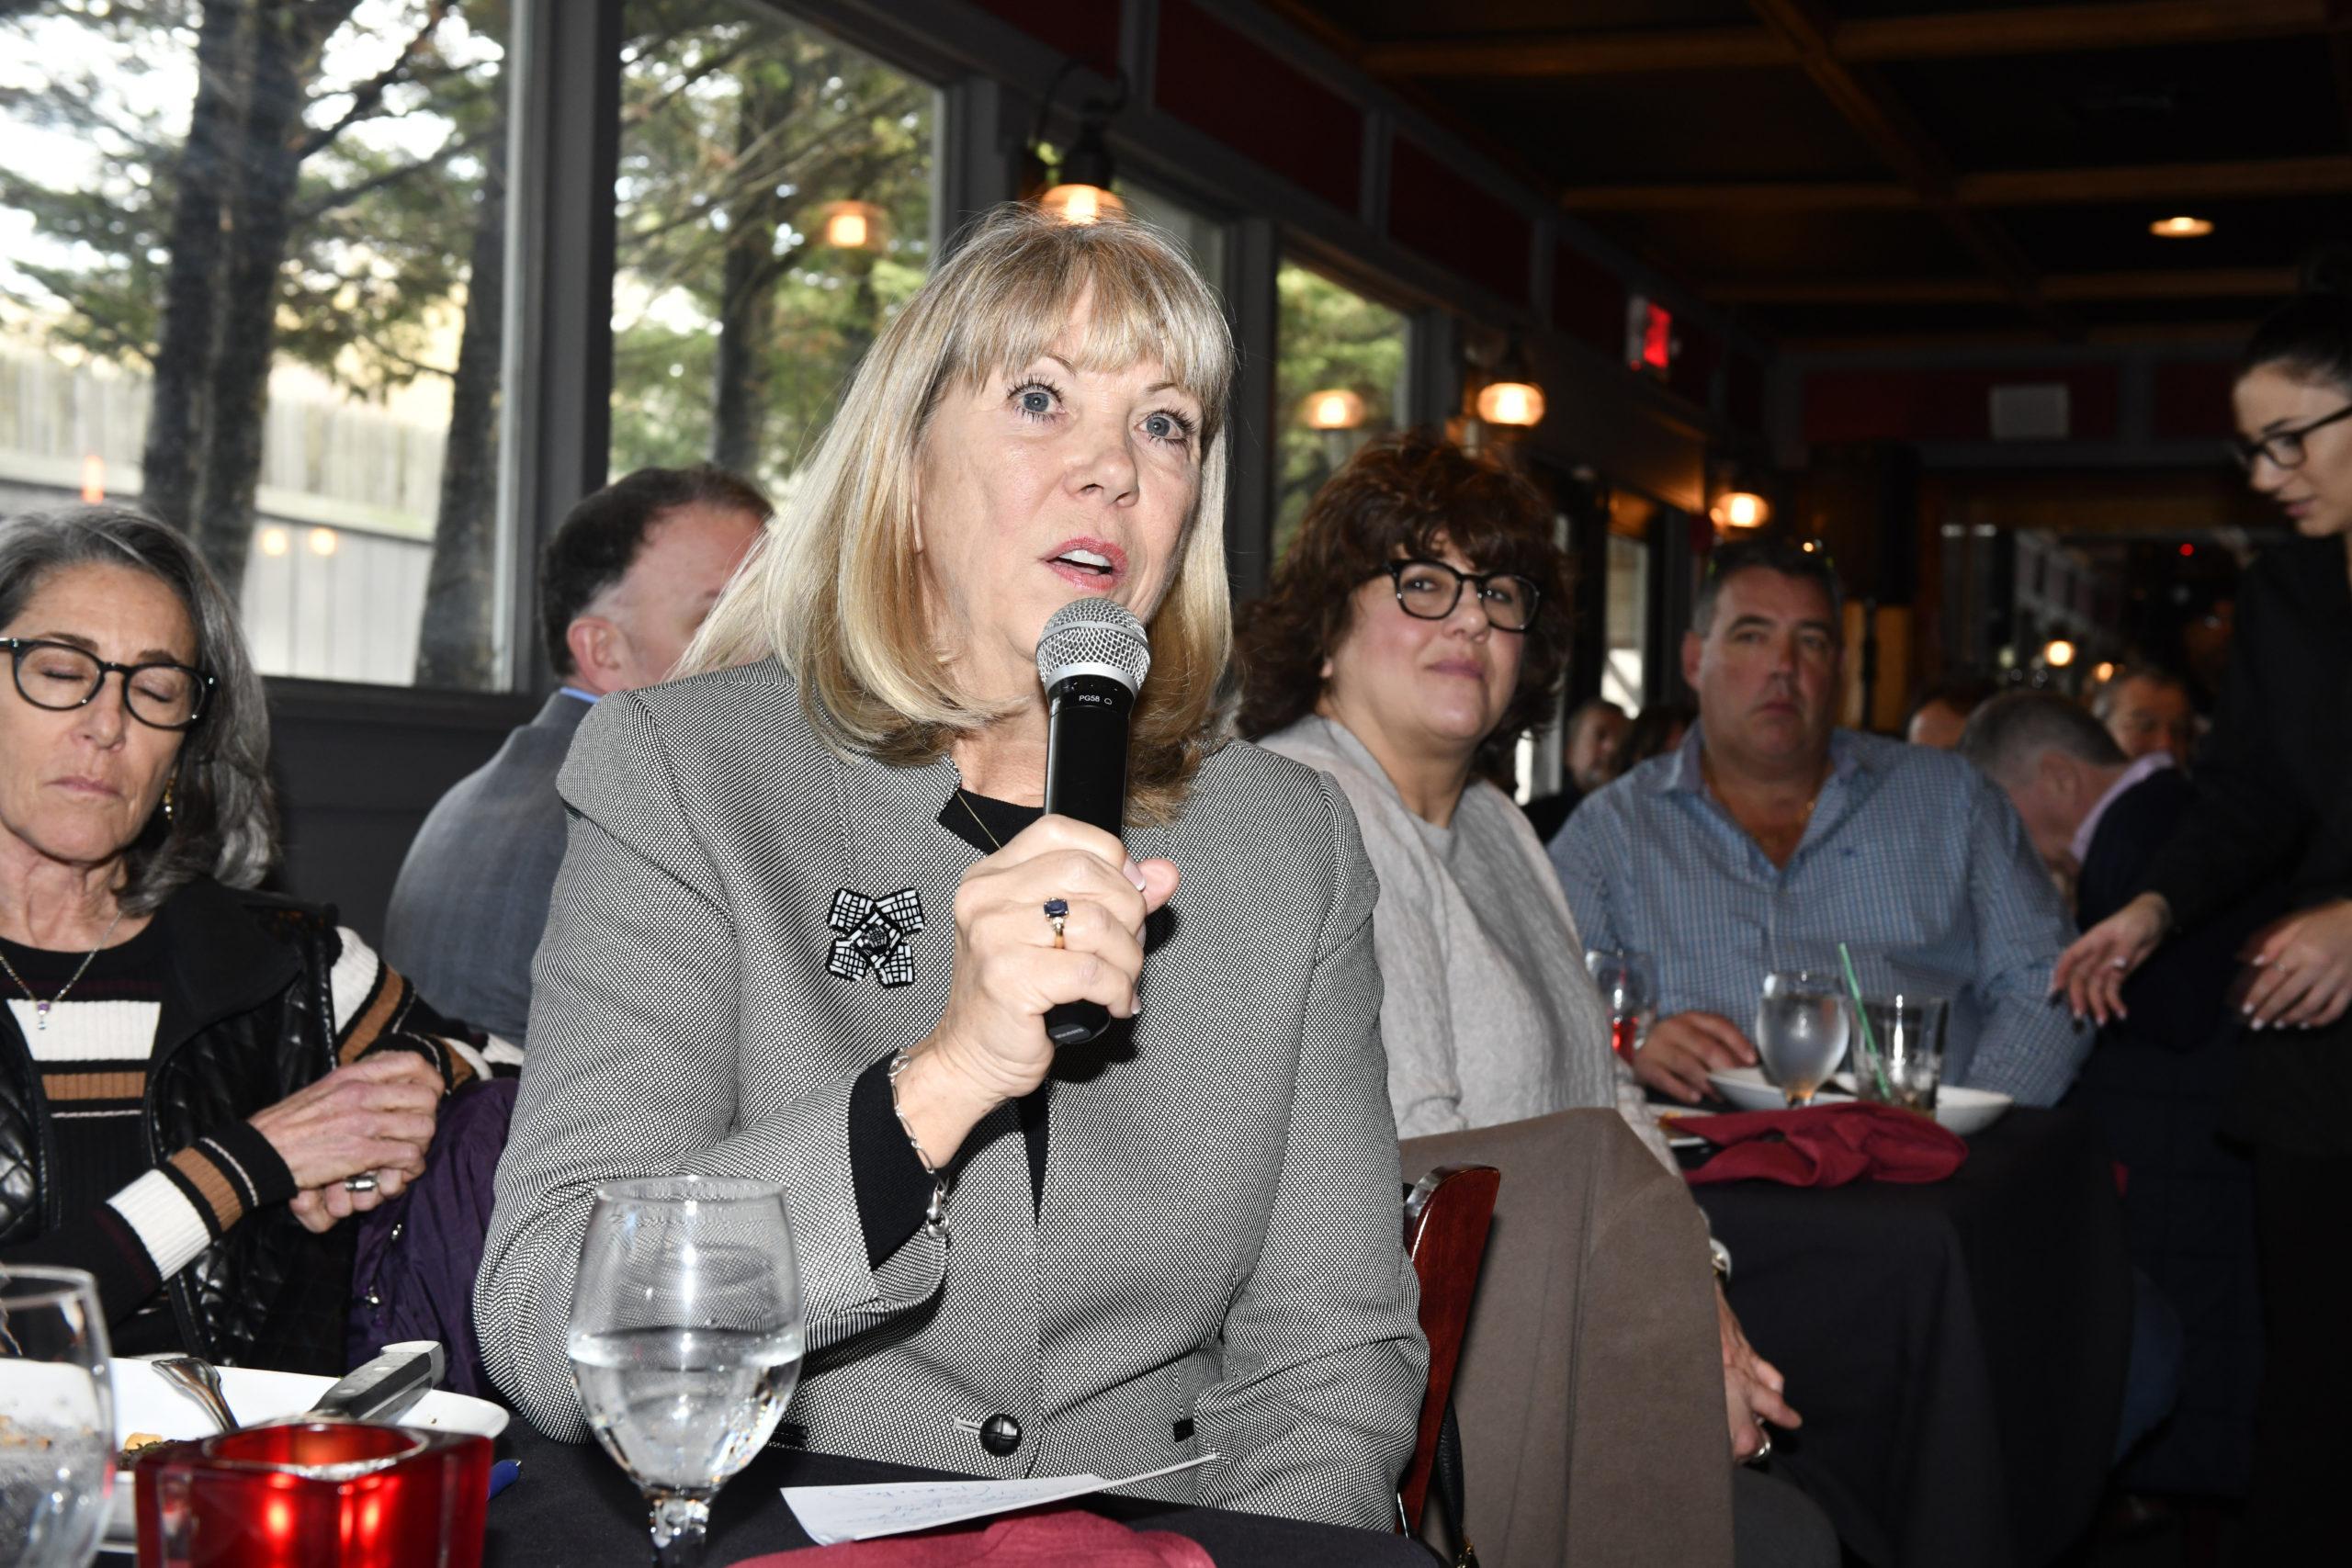 Susan von Freddi, president of the Hampton Bays Beautification Association puts a question to the panel.  DANA SHAW